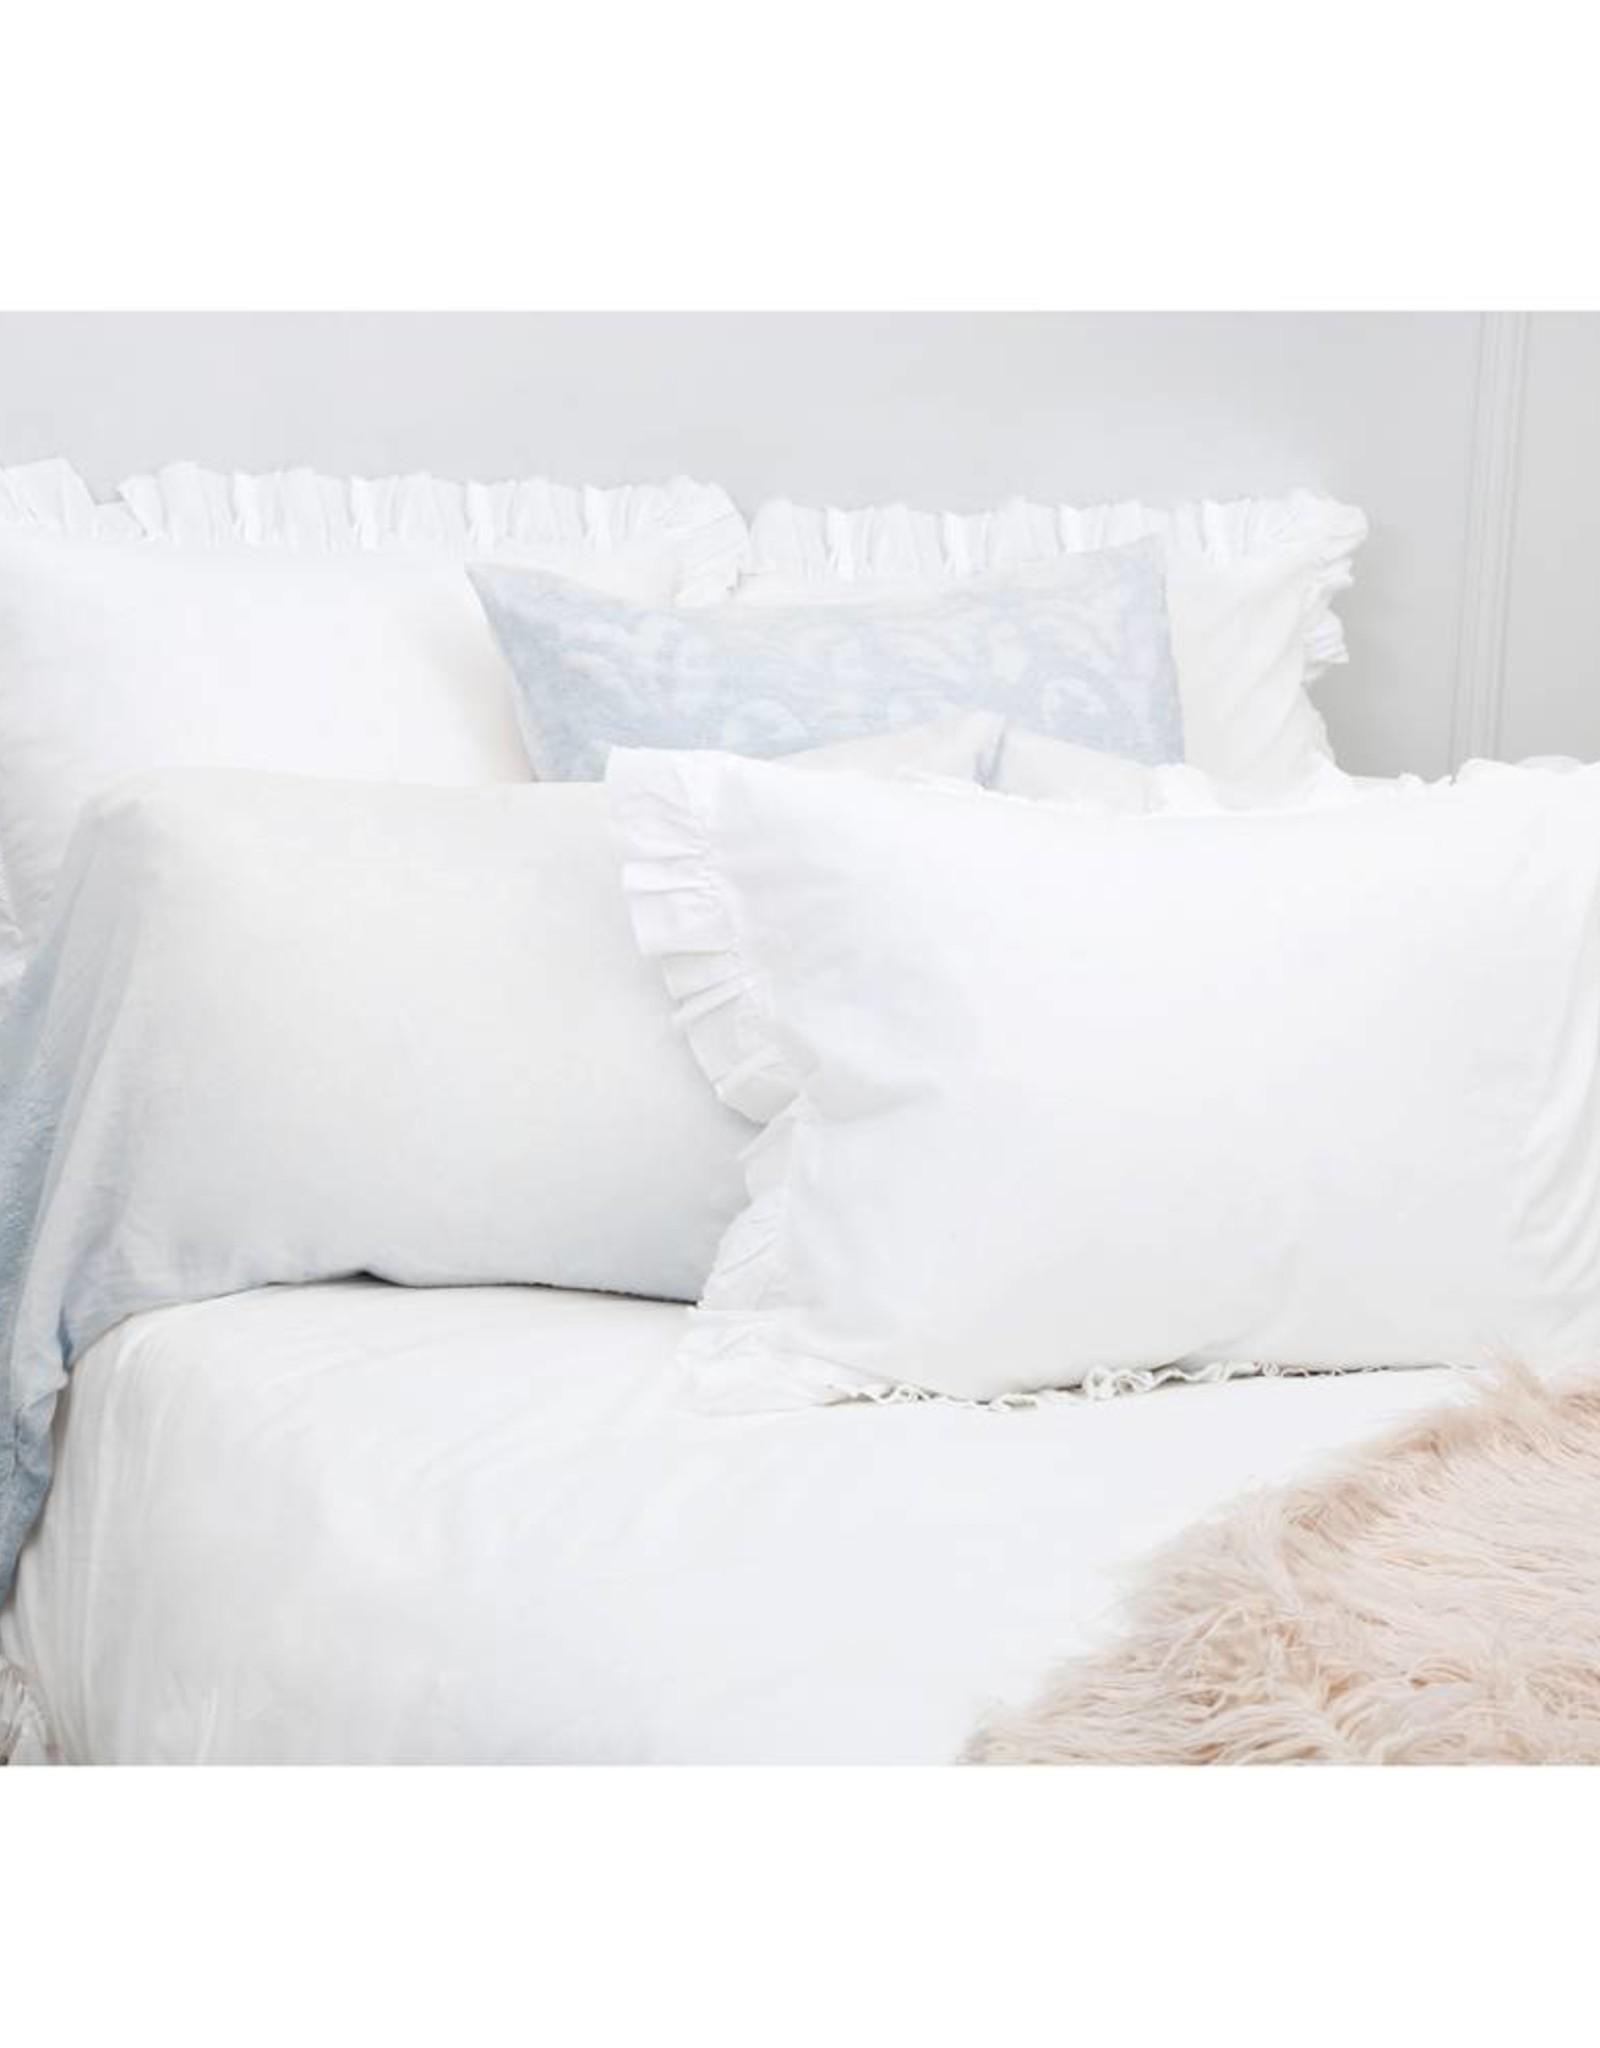 Pom Pom at Home Grace King Pillowcases - Powder Blue